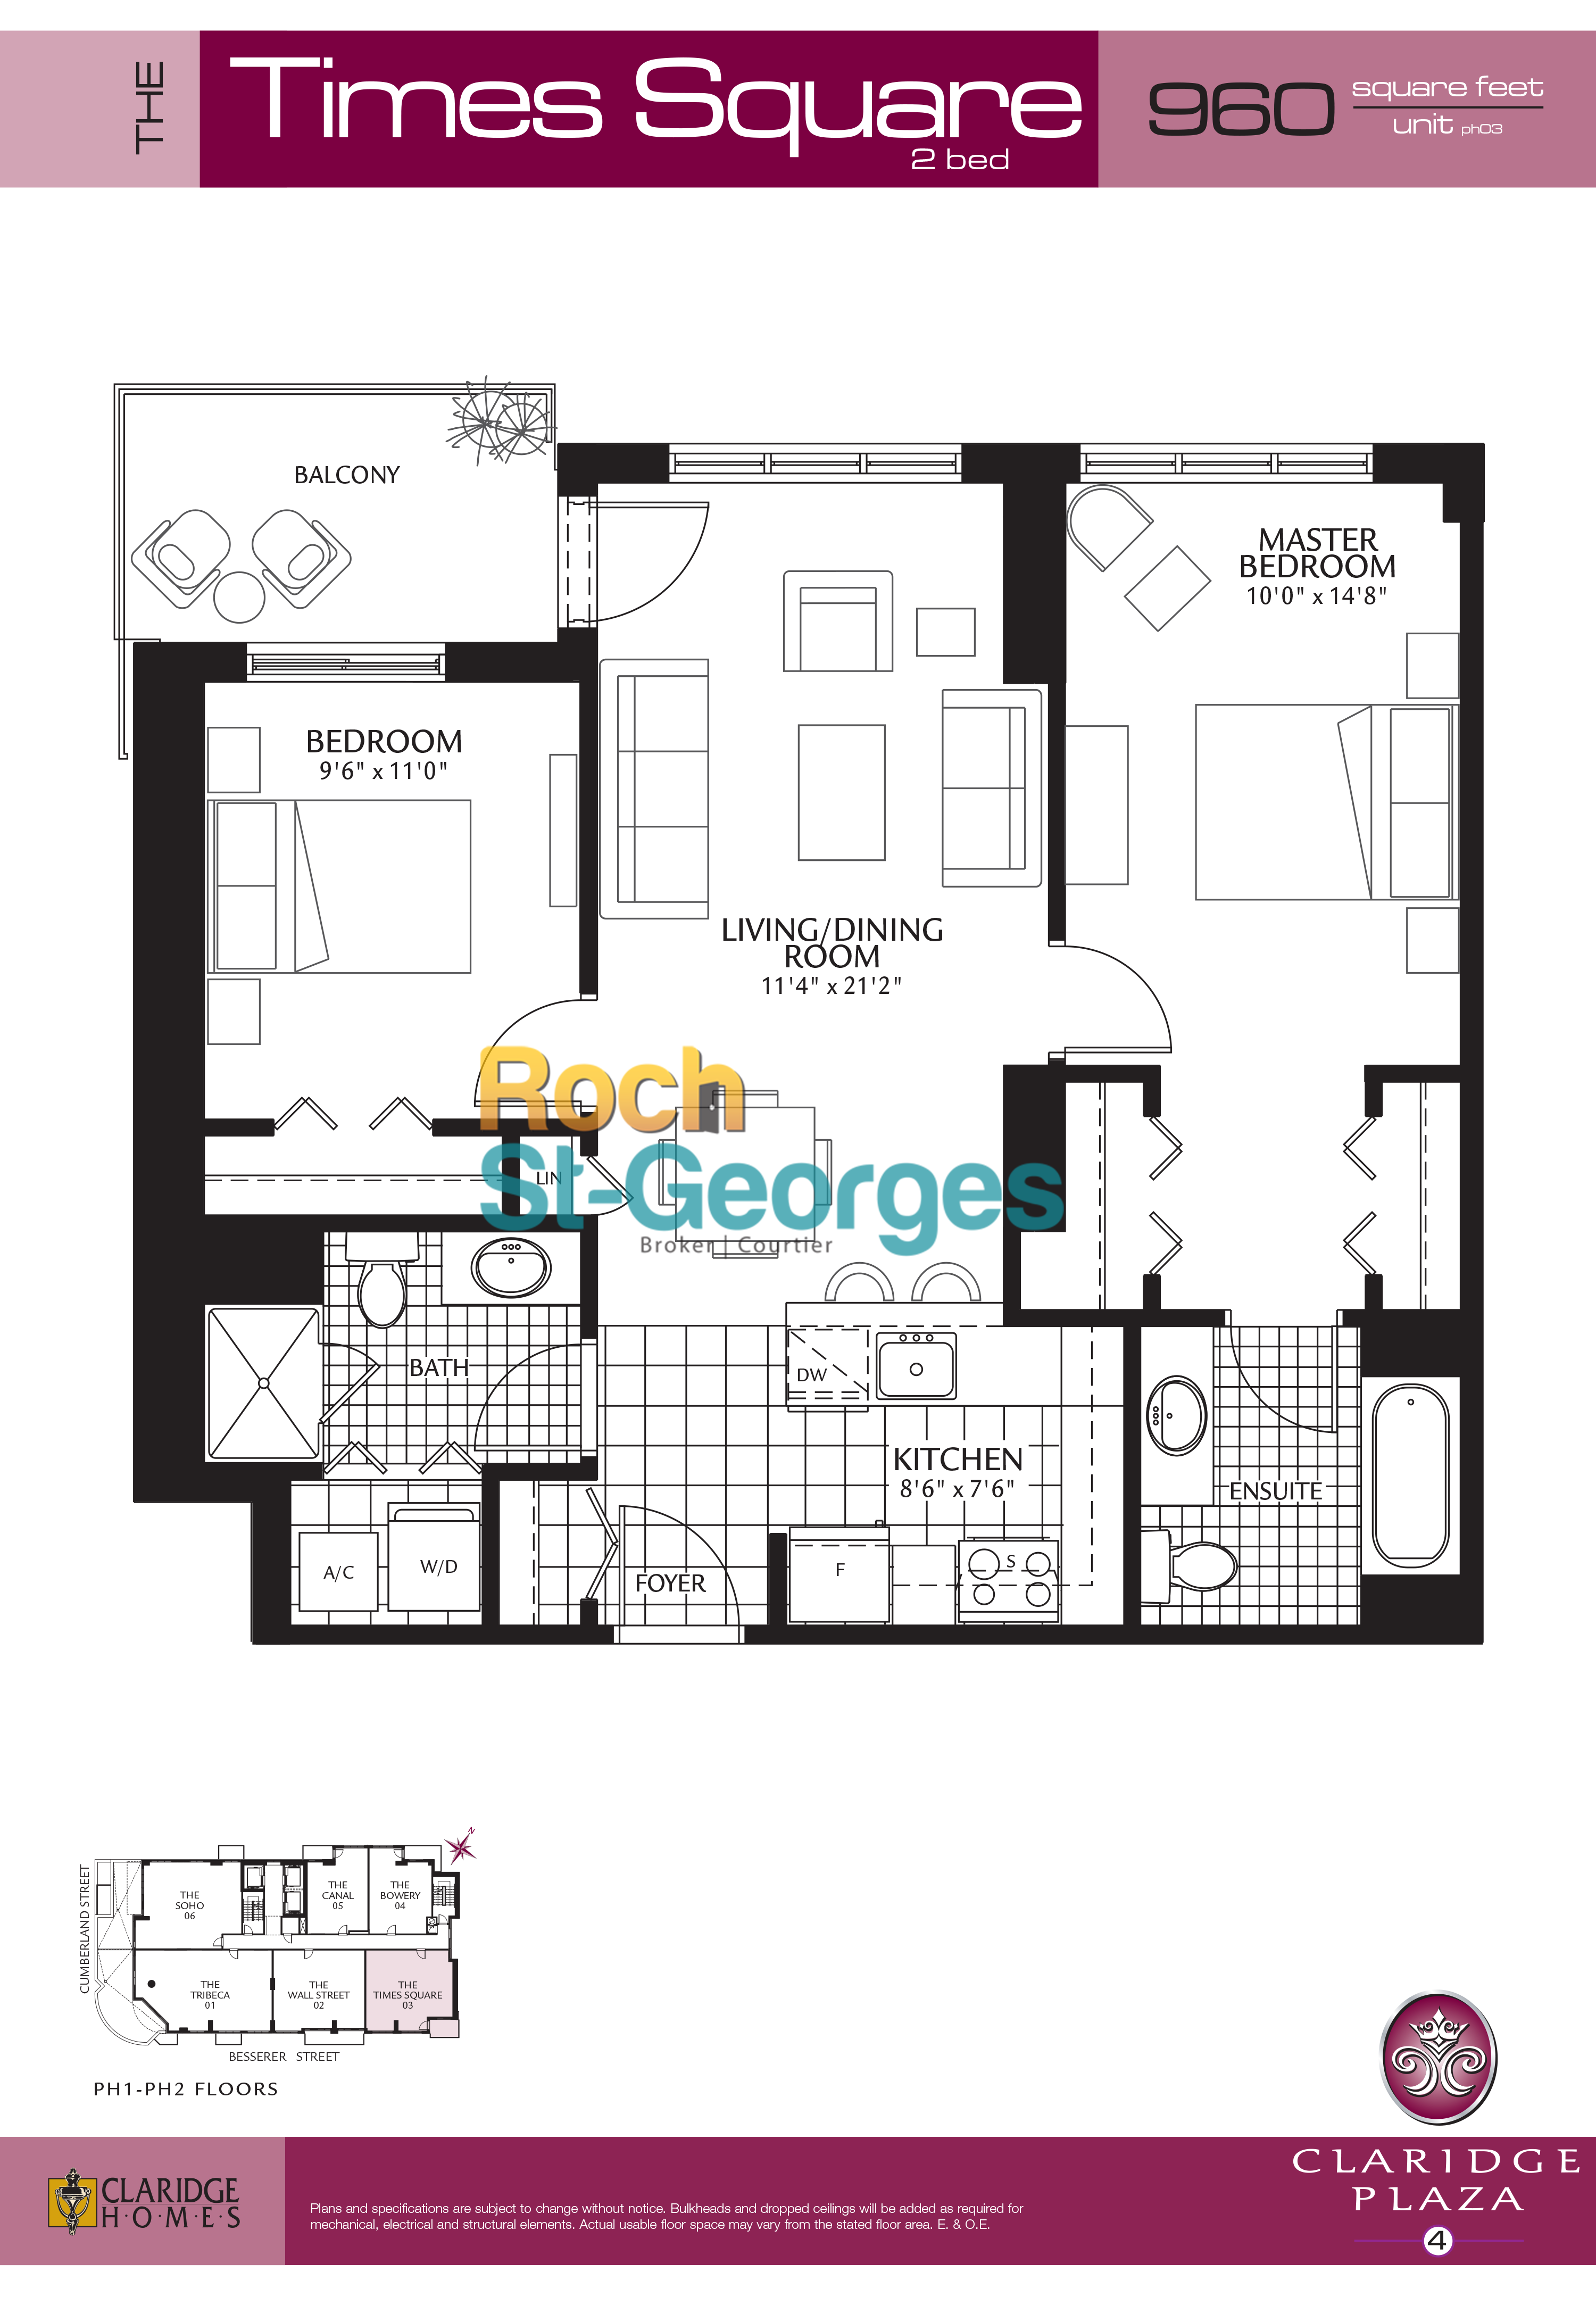 timesquare floorplan claridge